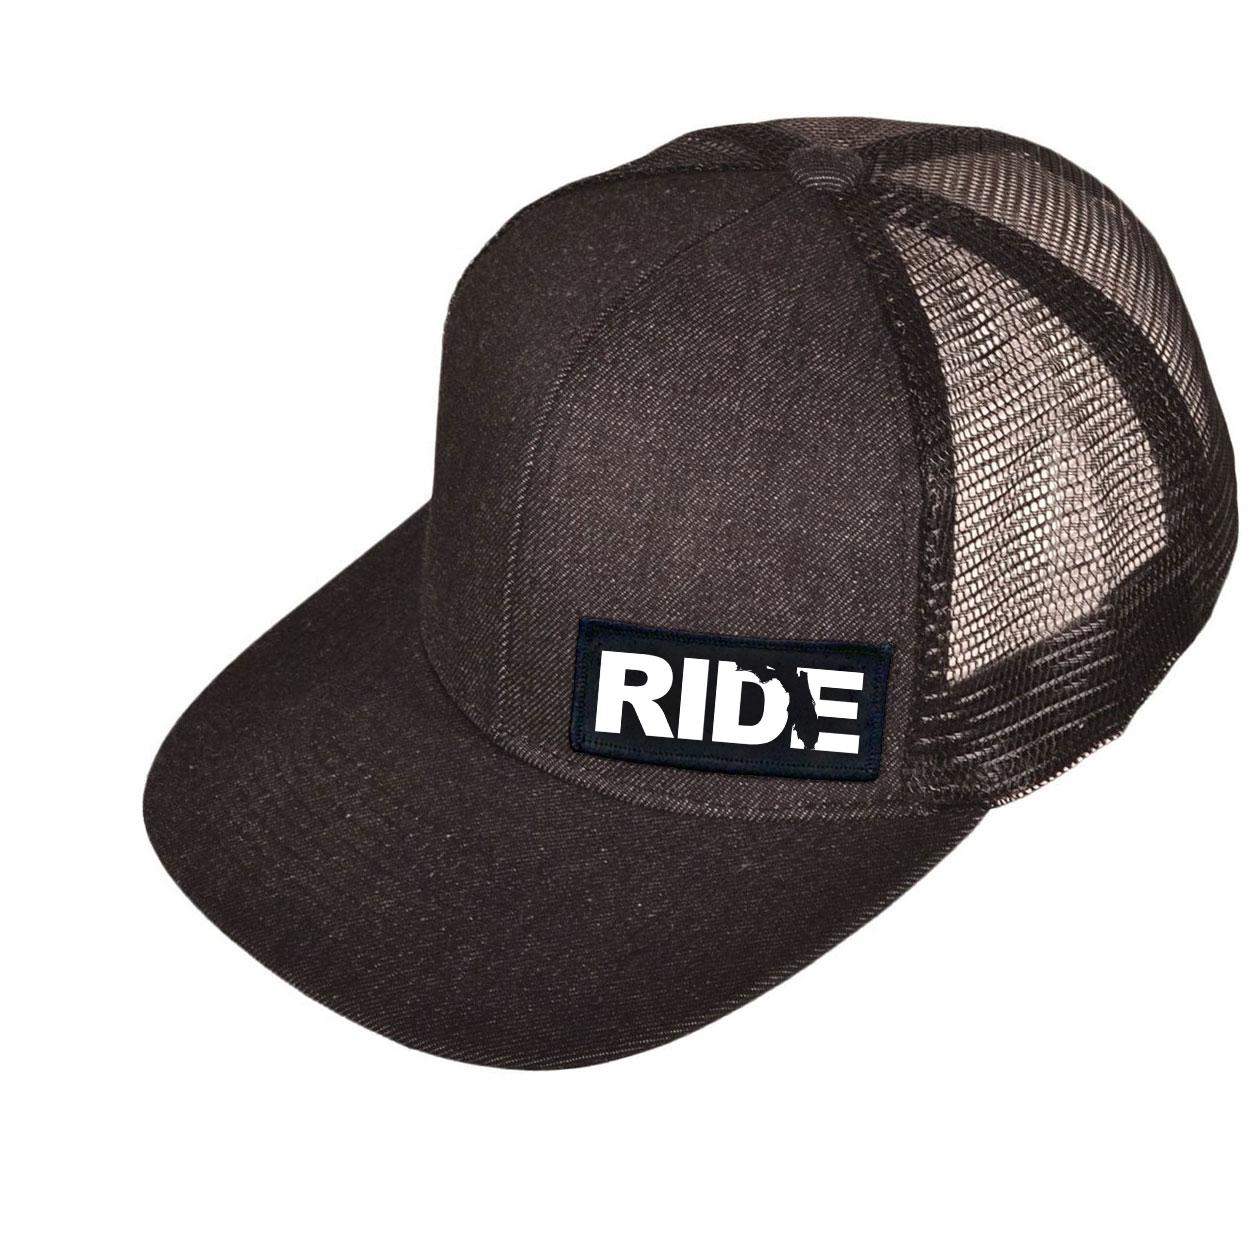 Ride Florida Night Out Woven Patch Snapback Flat Brim Hat Black Denim (White Logo)